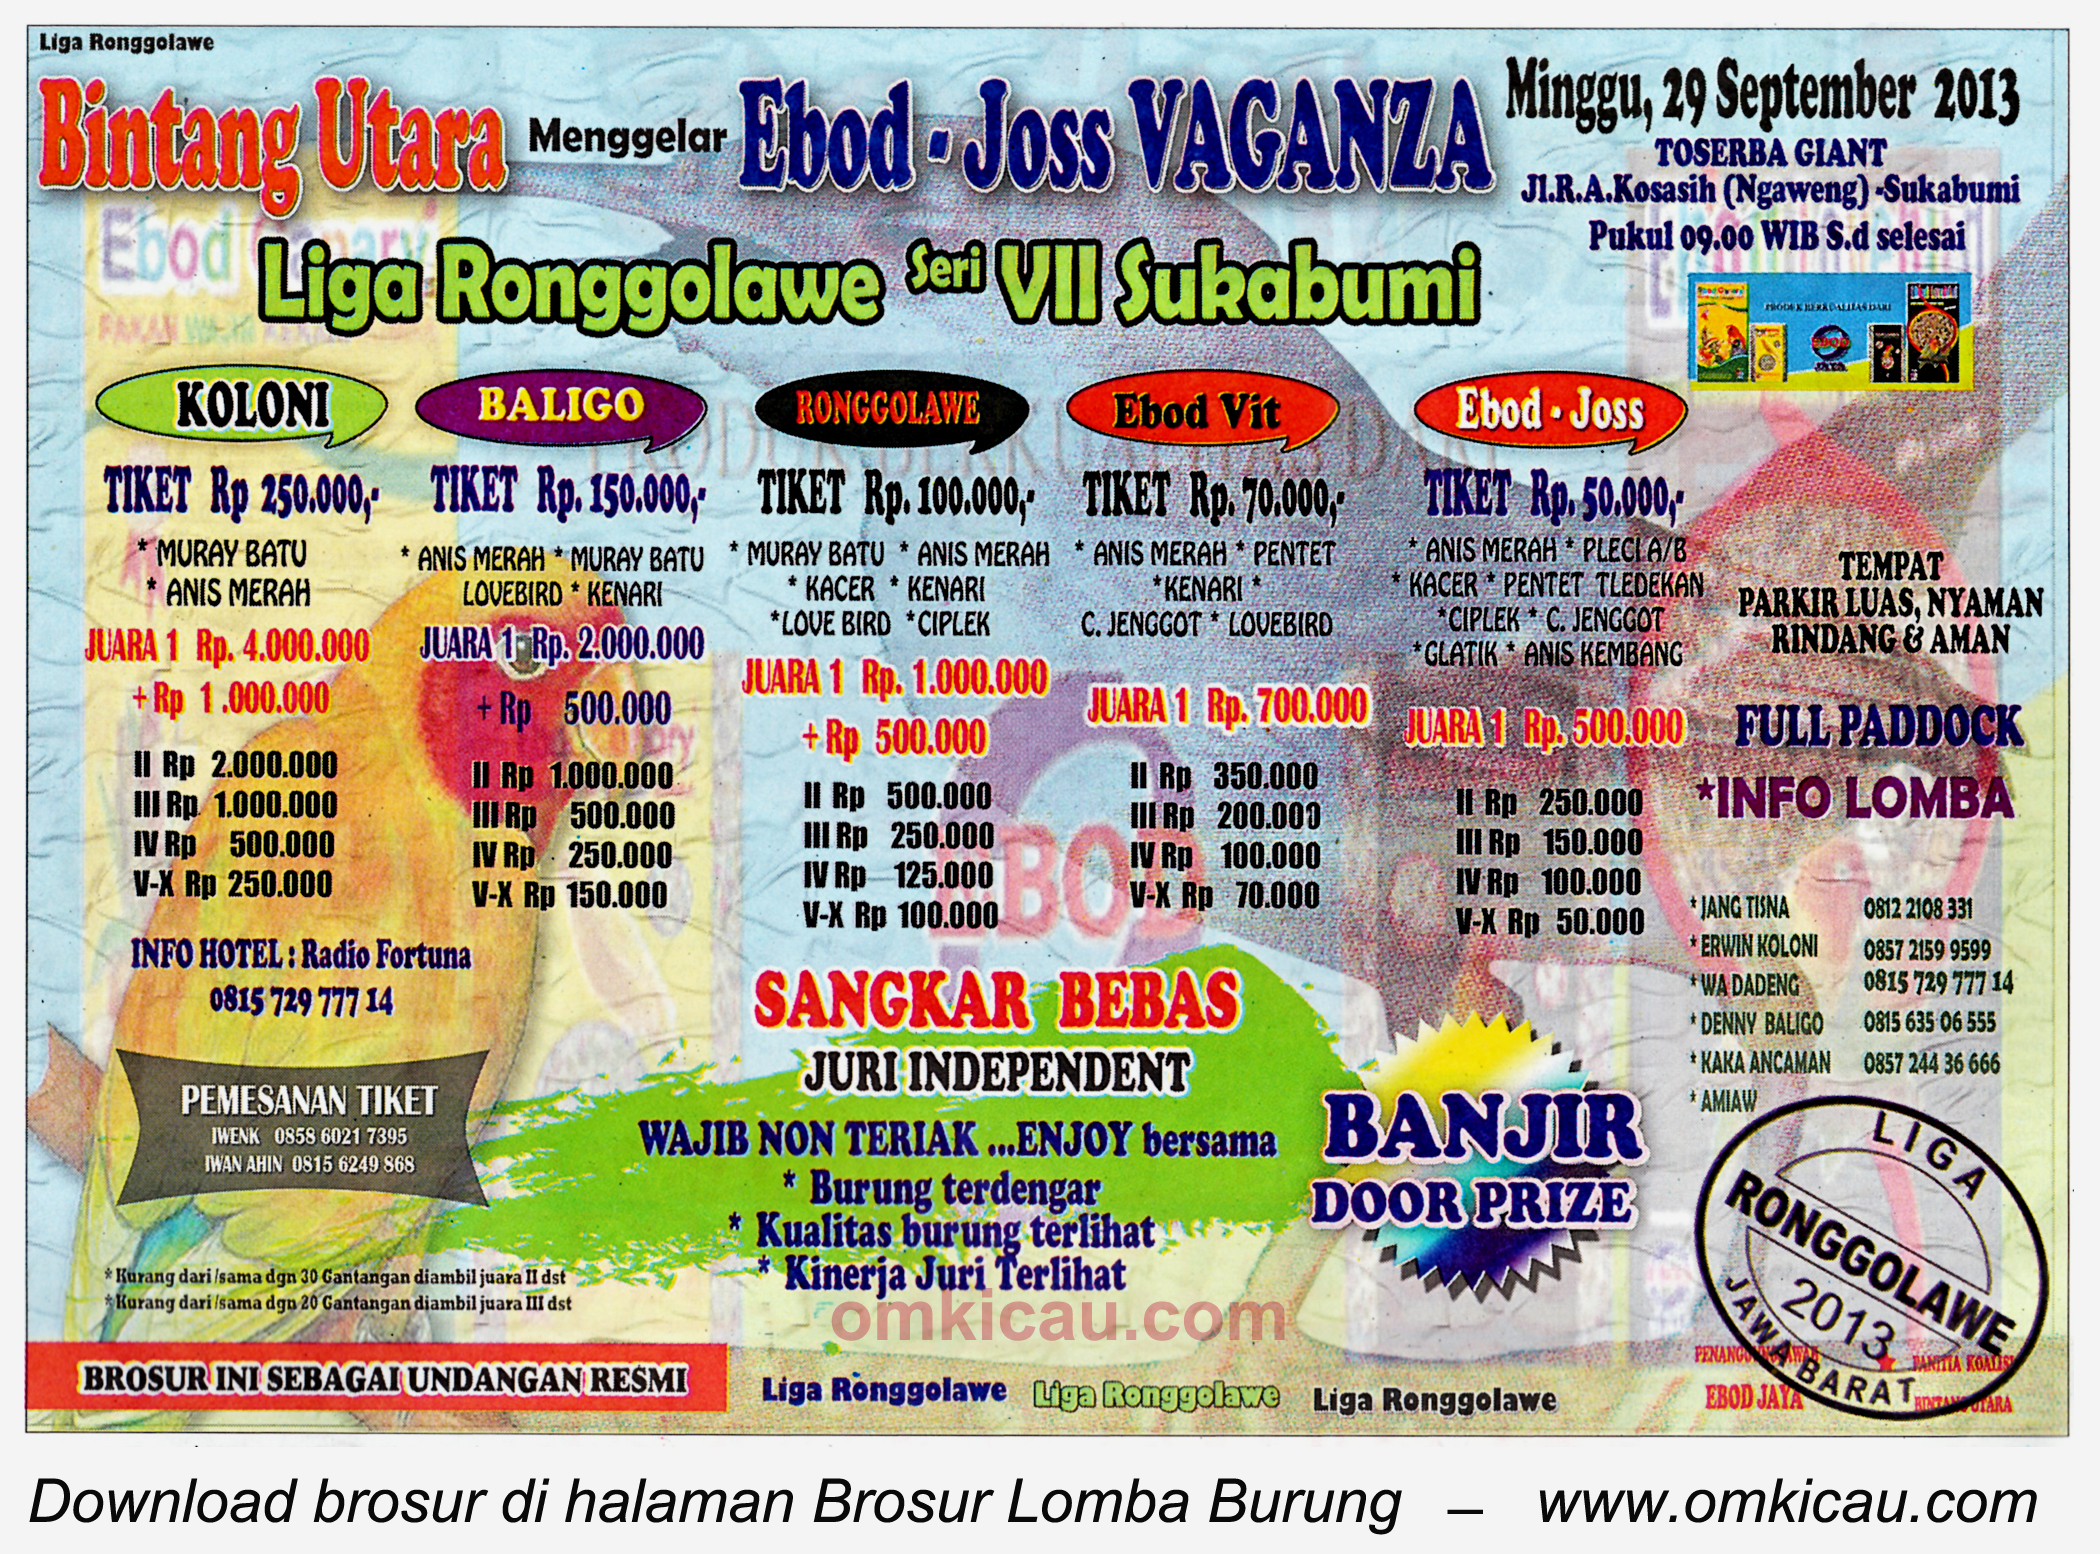 Brosur Lomba Burung Ebod Joss Vaganza (LRJ 7), Sukabumi, 29 September 2913